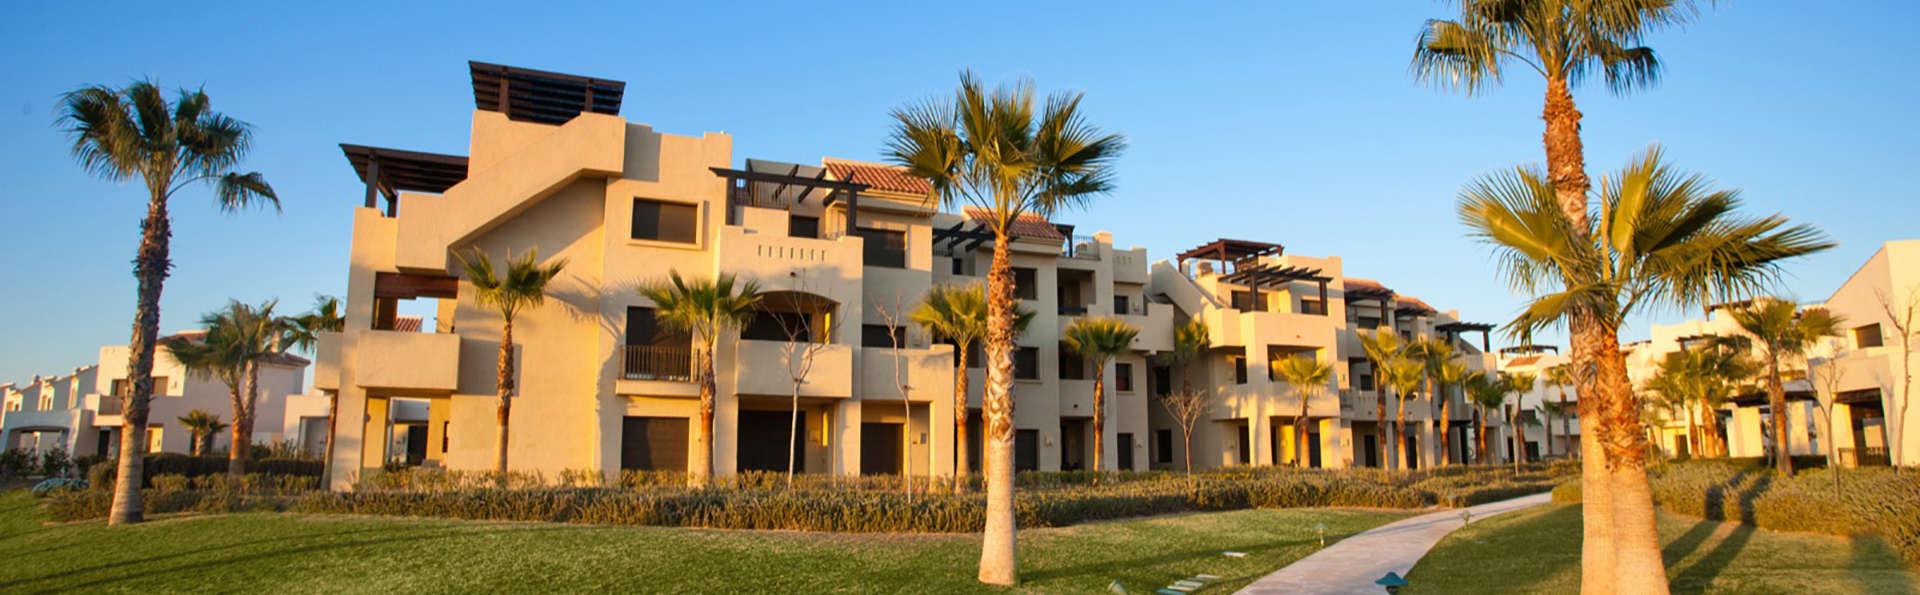 Apartamentos Turísticos Roda Golf & Beach Resort - edit_Curved_afternoon.jpg